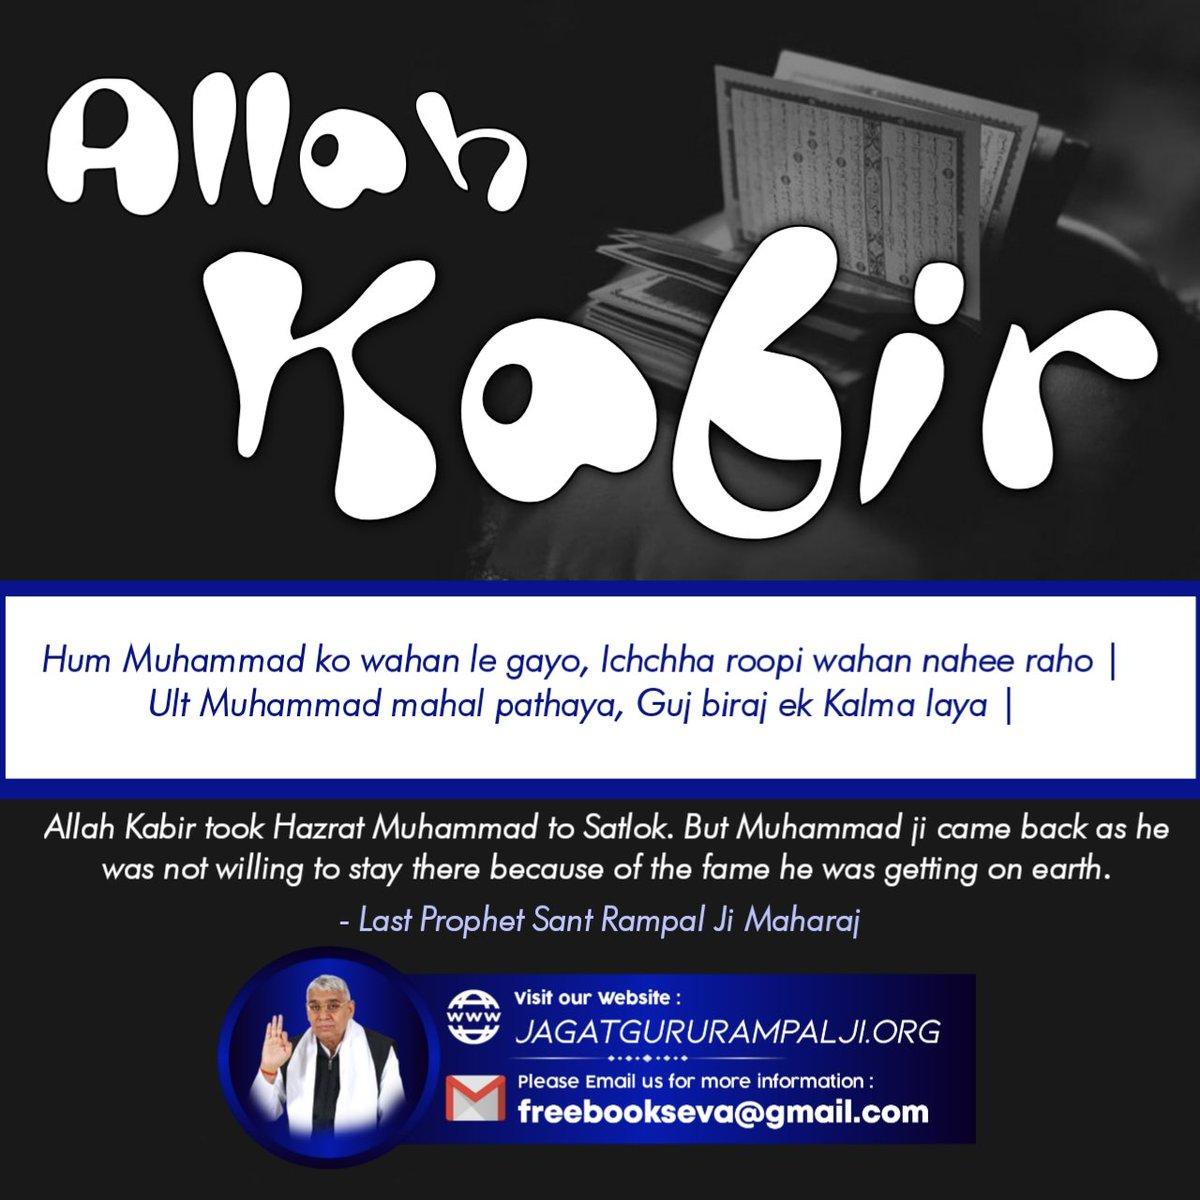 #Allah_In_Quran #SundayMotivation #SundayThoughts  Allah Kabir met Hazrat Adam, Hazrat Musa and Prophet Muhammad in the form of Al - Khidr. He is not formless.  - Baakhabar Saint Rampal Ji Maharaj Last Prophet Saint Rampal Ji #Allah_In_Quran